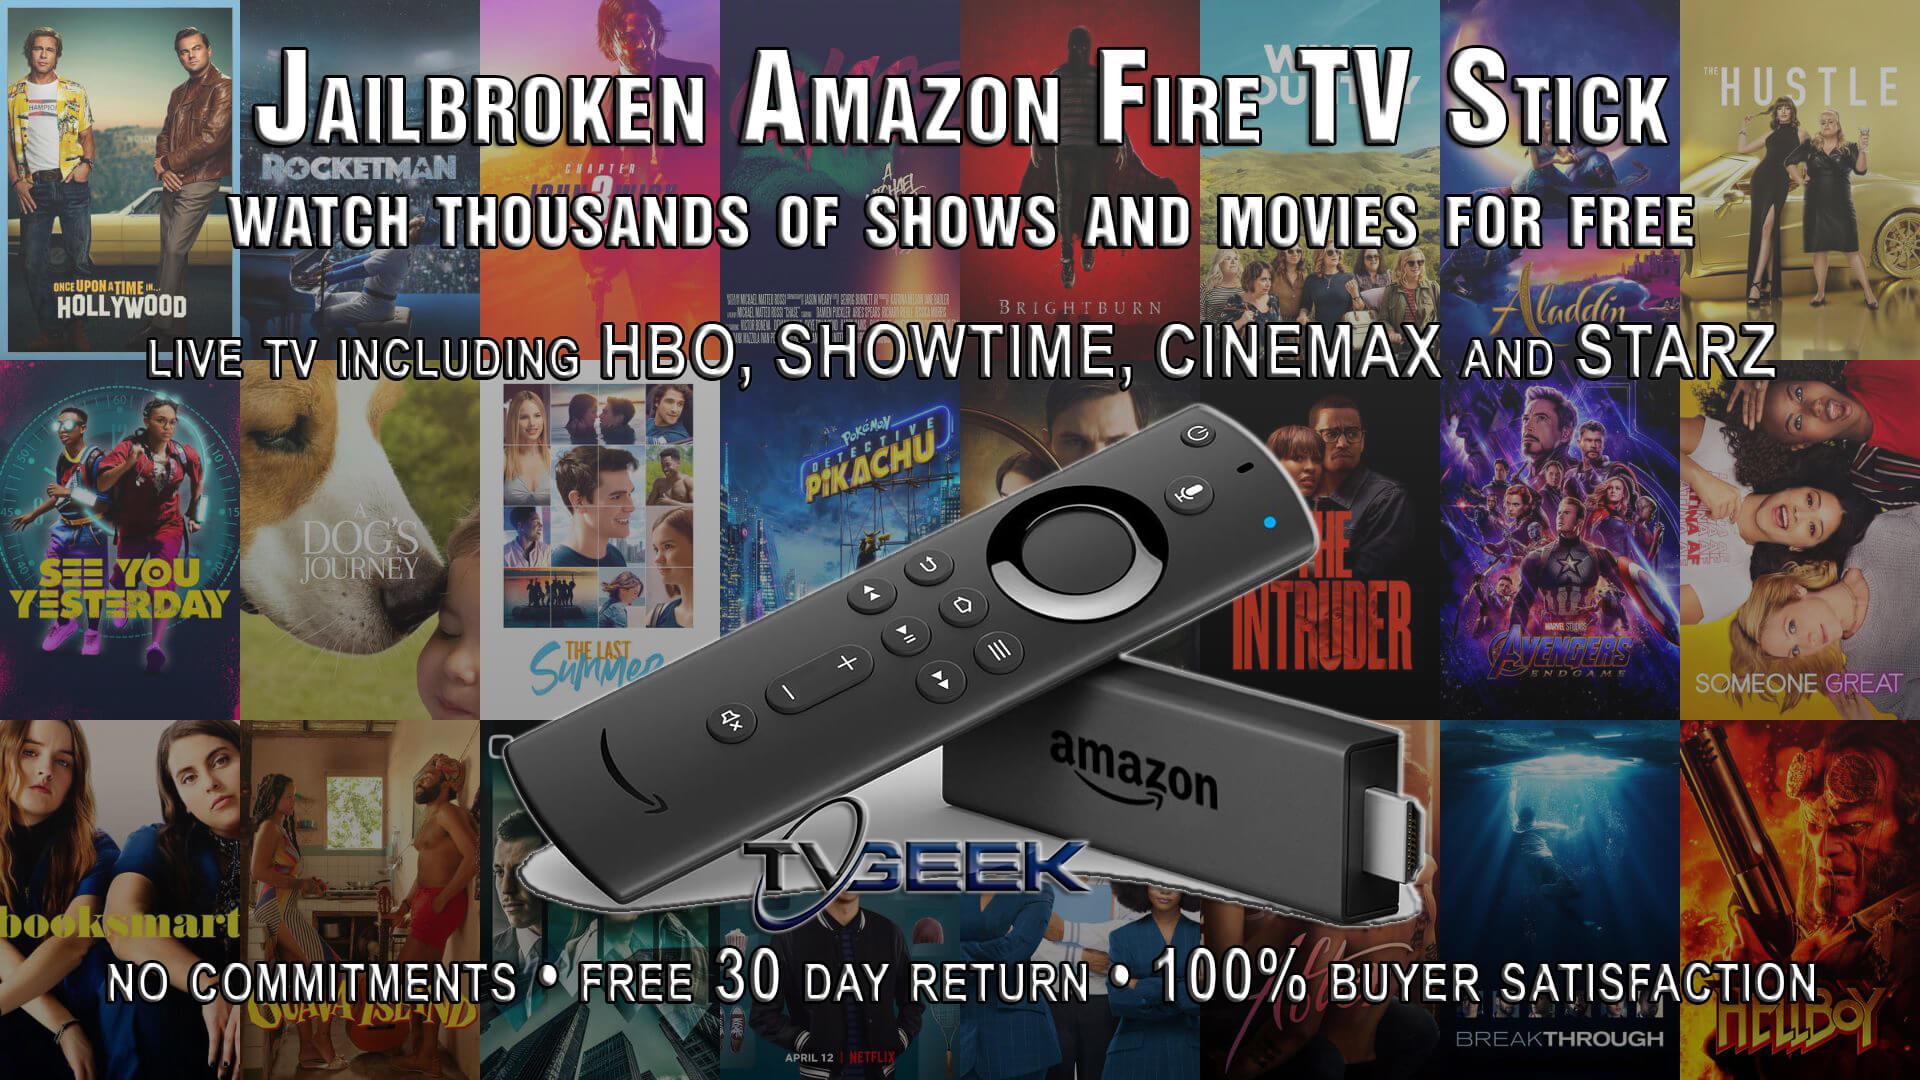 Jailbroken Amazon Fire TV Stick with Fully Loaded Kodi 18